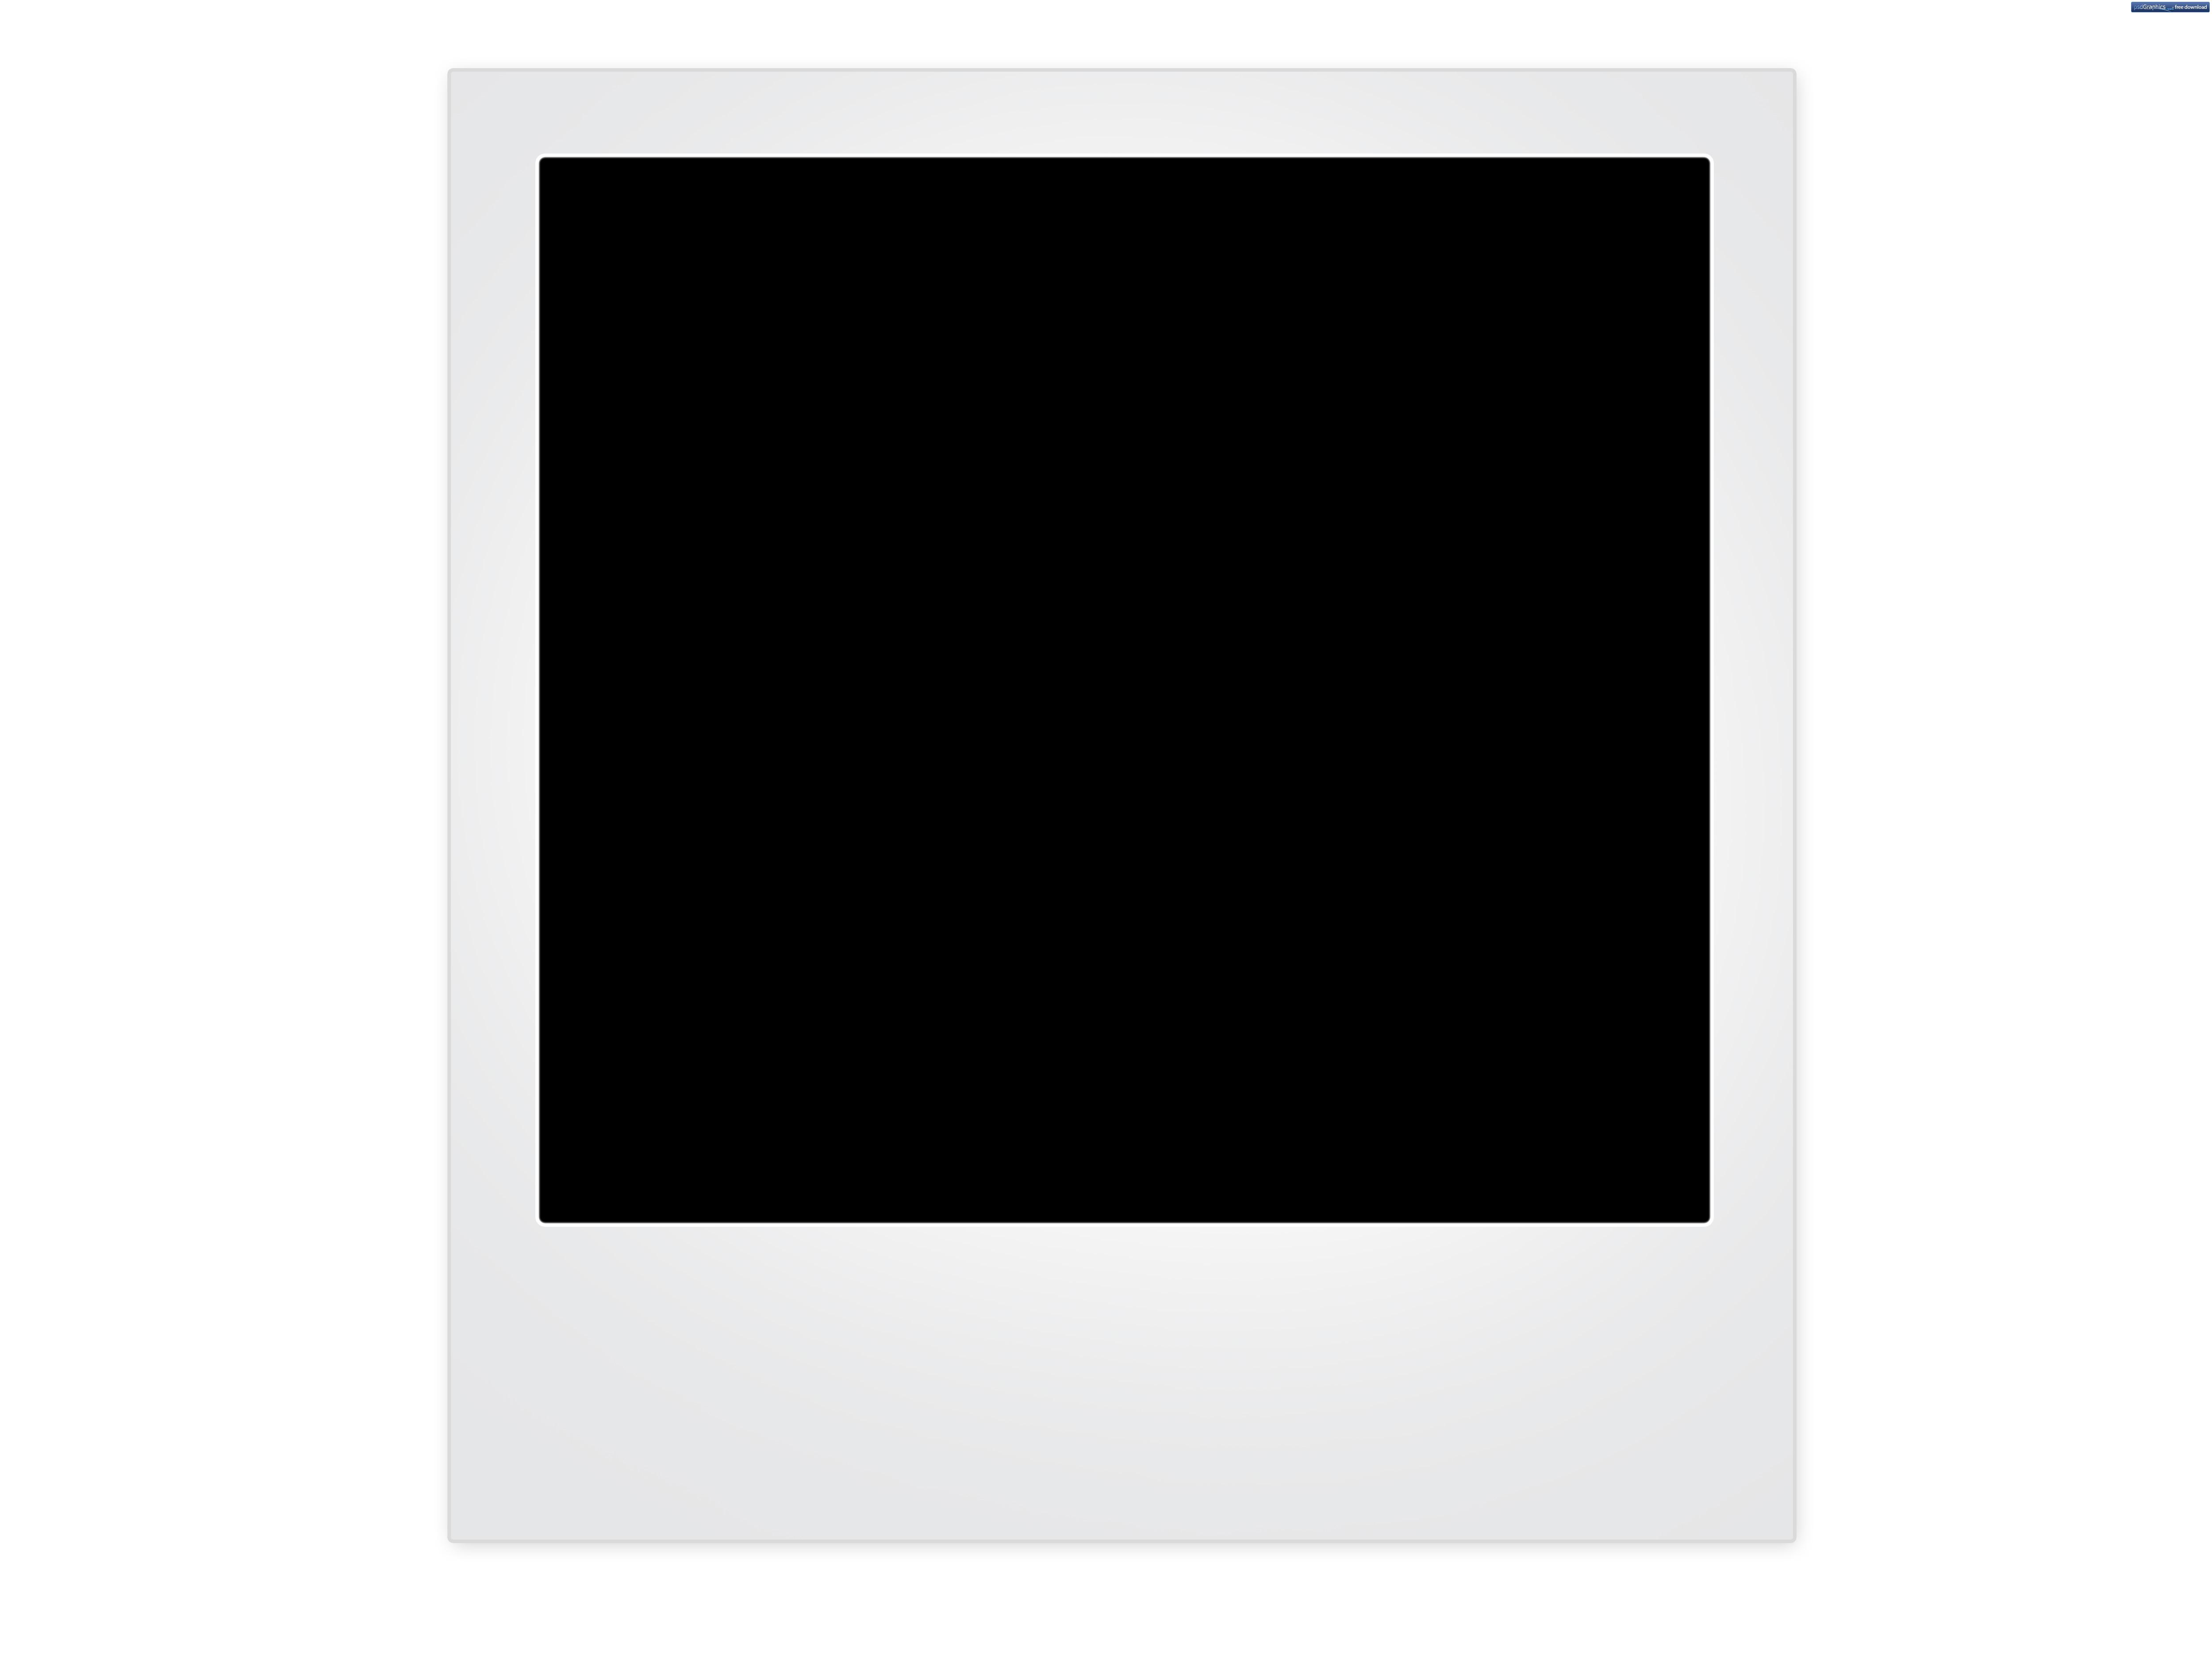 Blank polaroid frame background.